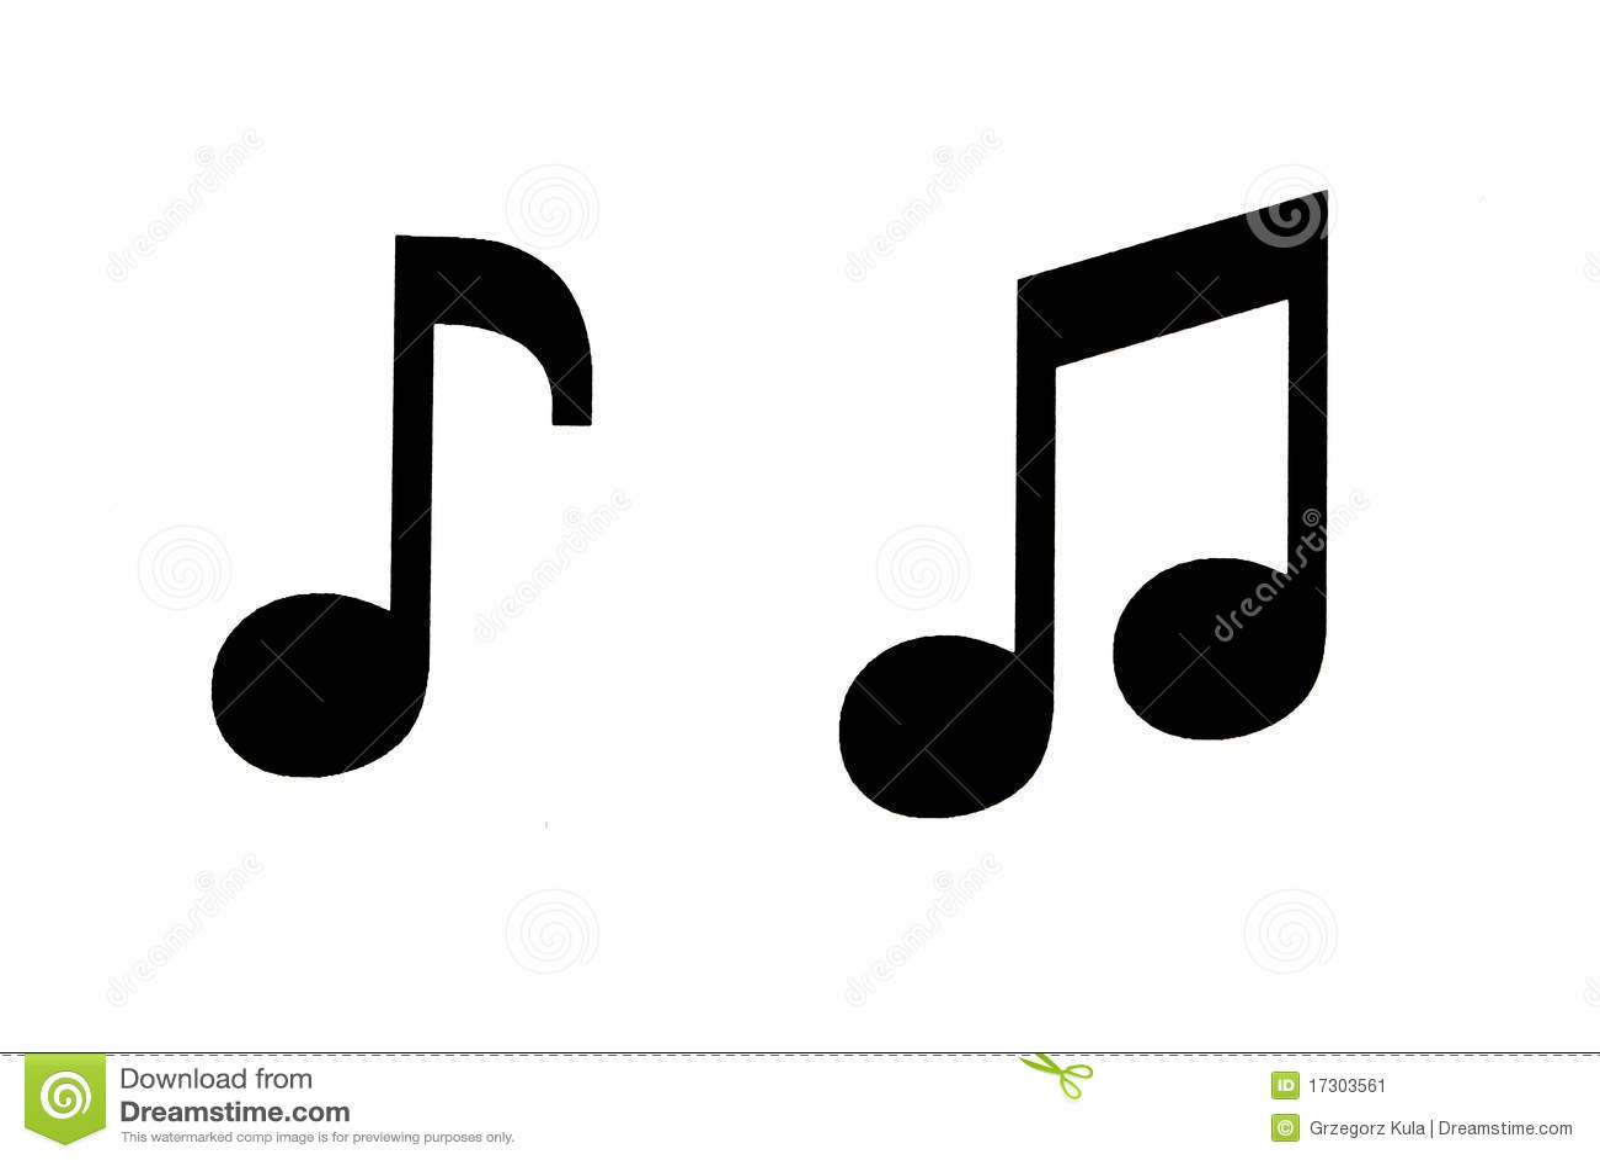 Music Notes Stock Illustration Illustration Of Symbol 17303561